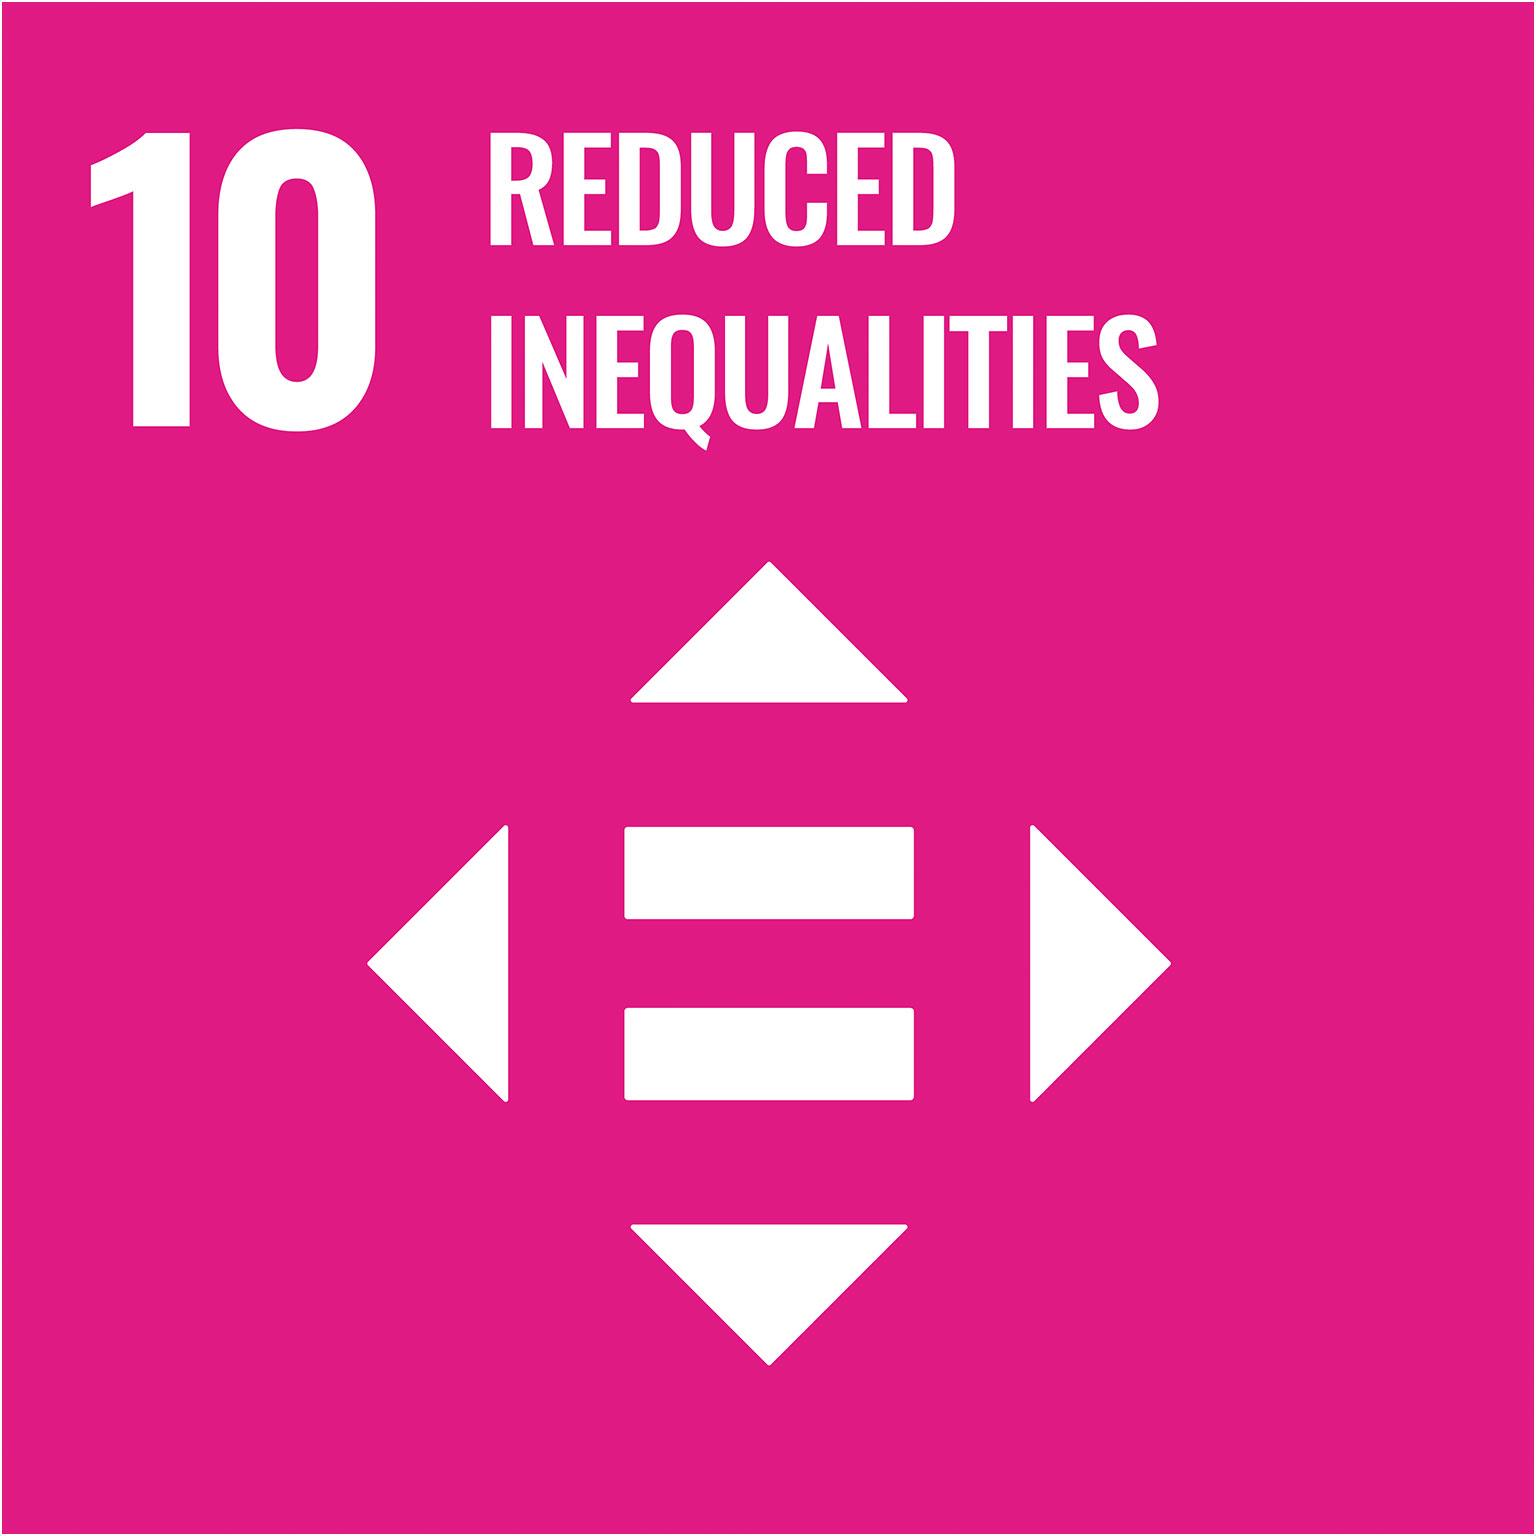 sustainable development goals: reduced inequalities